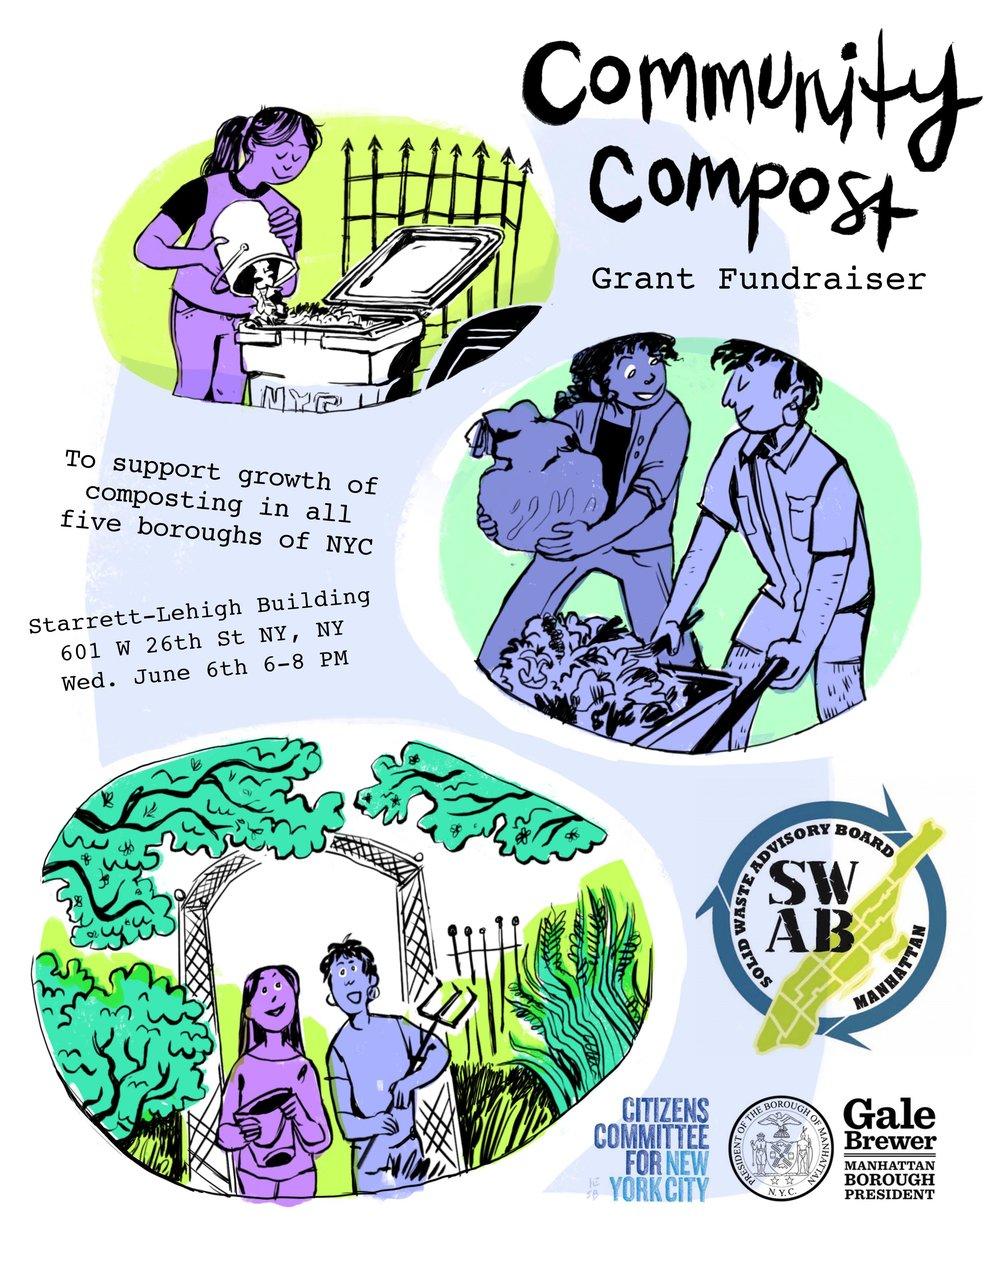 Community Compost Grant Fundraiser Flyer.jpg